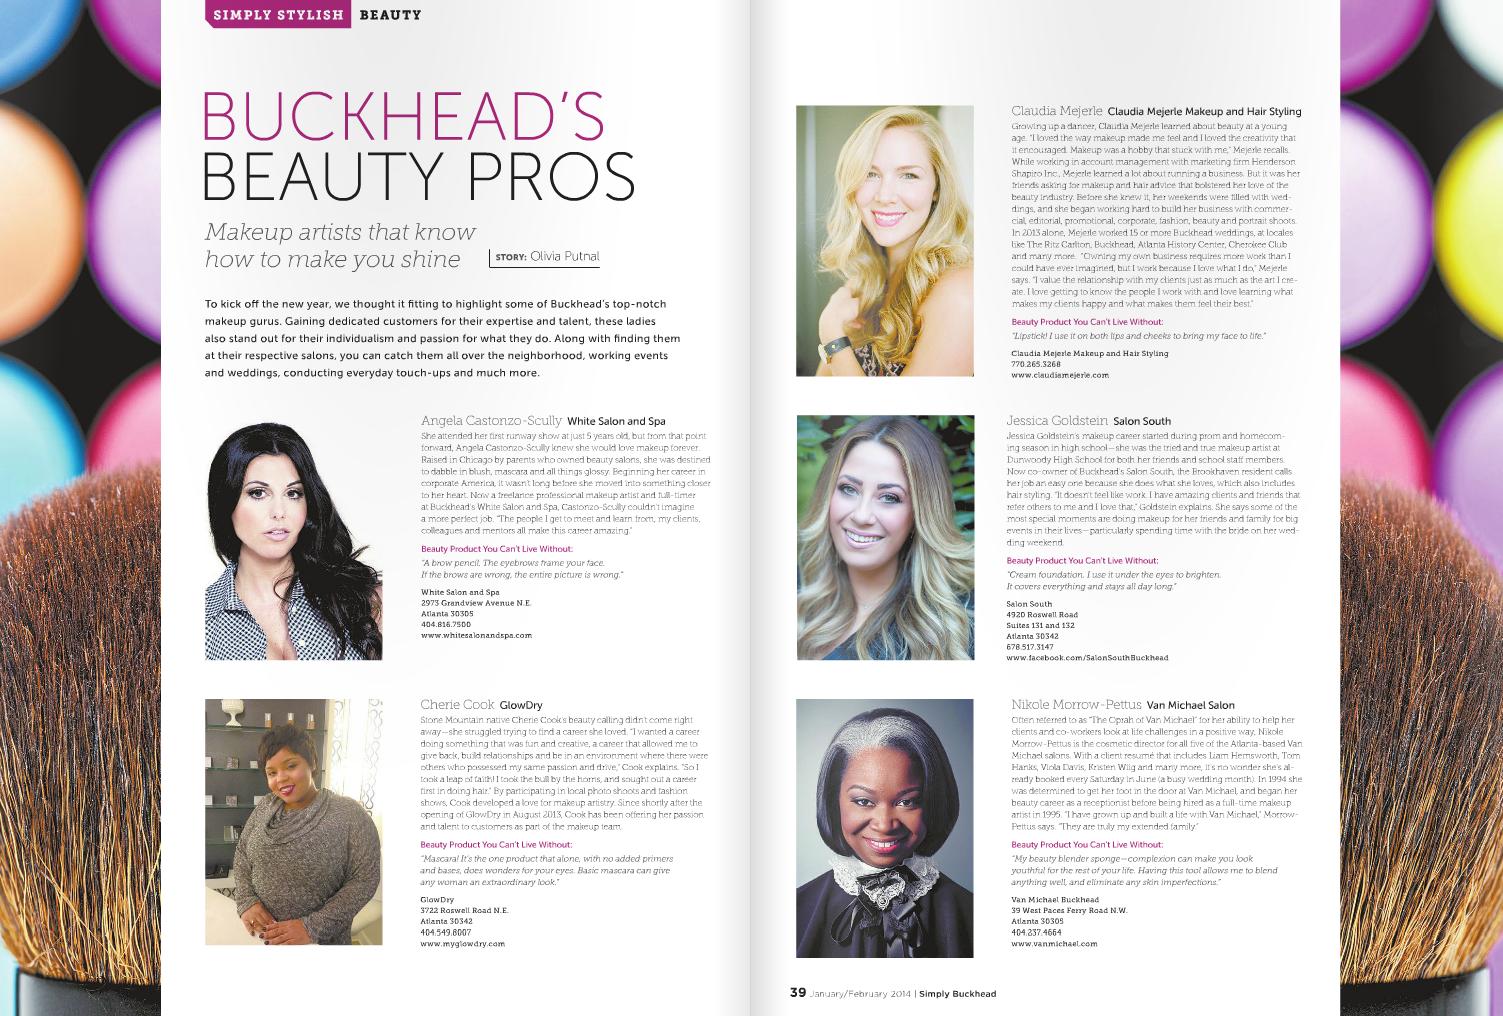 Simply Buckhead Jan/Feb 2014 - Buckhead Beauty Pros